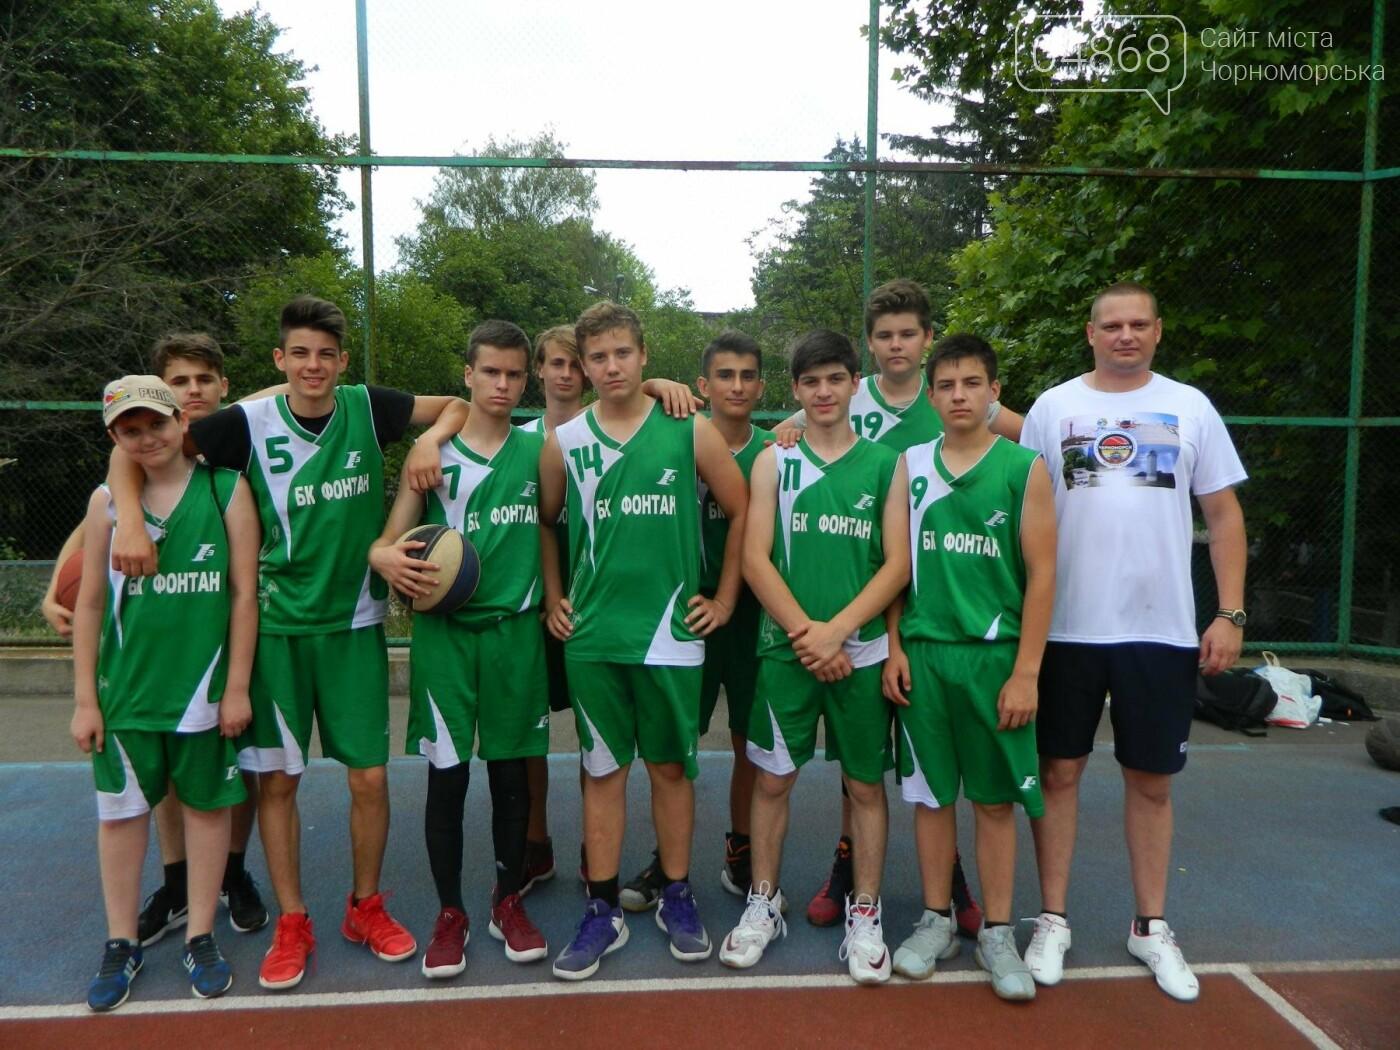 Баскетболу в Черноморске - «В добрый час!», фото-10